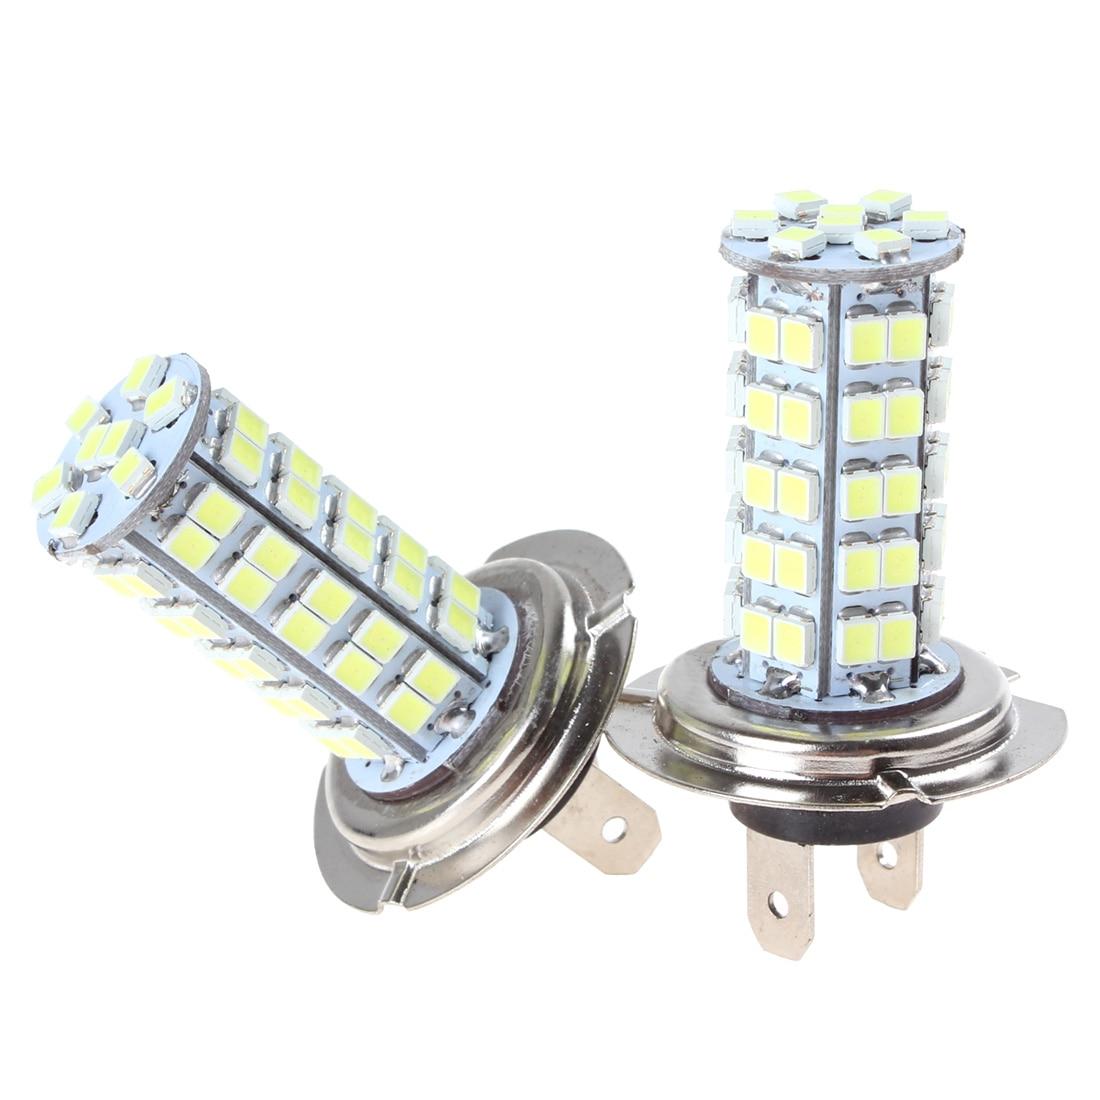 2pcs H7 LED Car Fog Light With 68 SMD LED Xenon Auto Fog Lamp White Bulbs